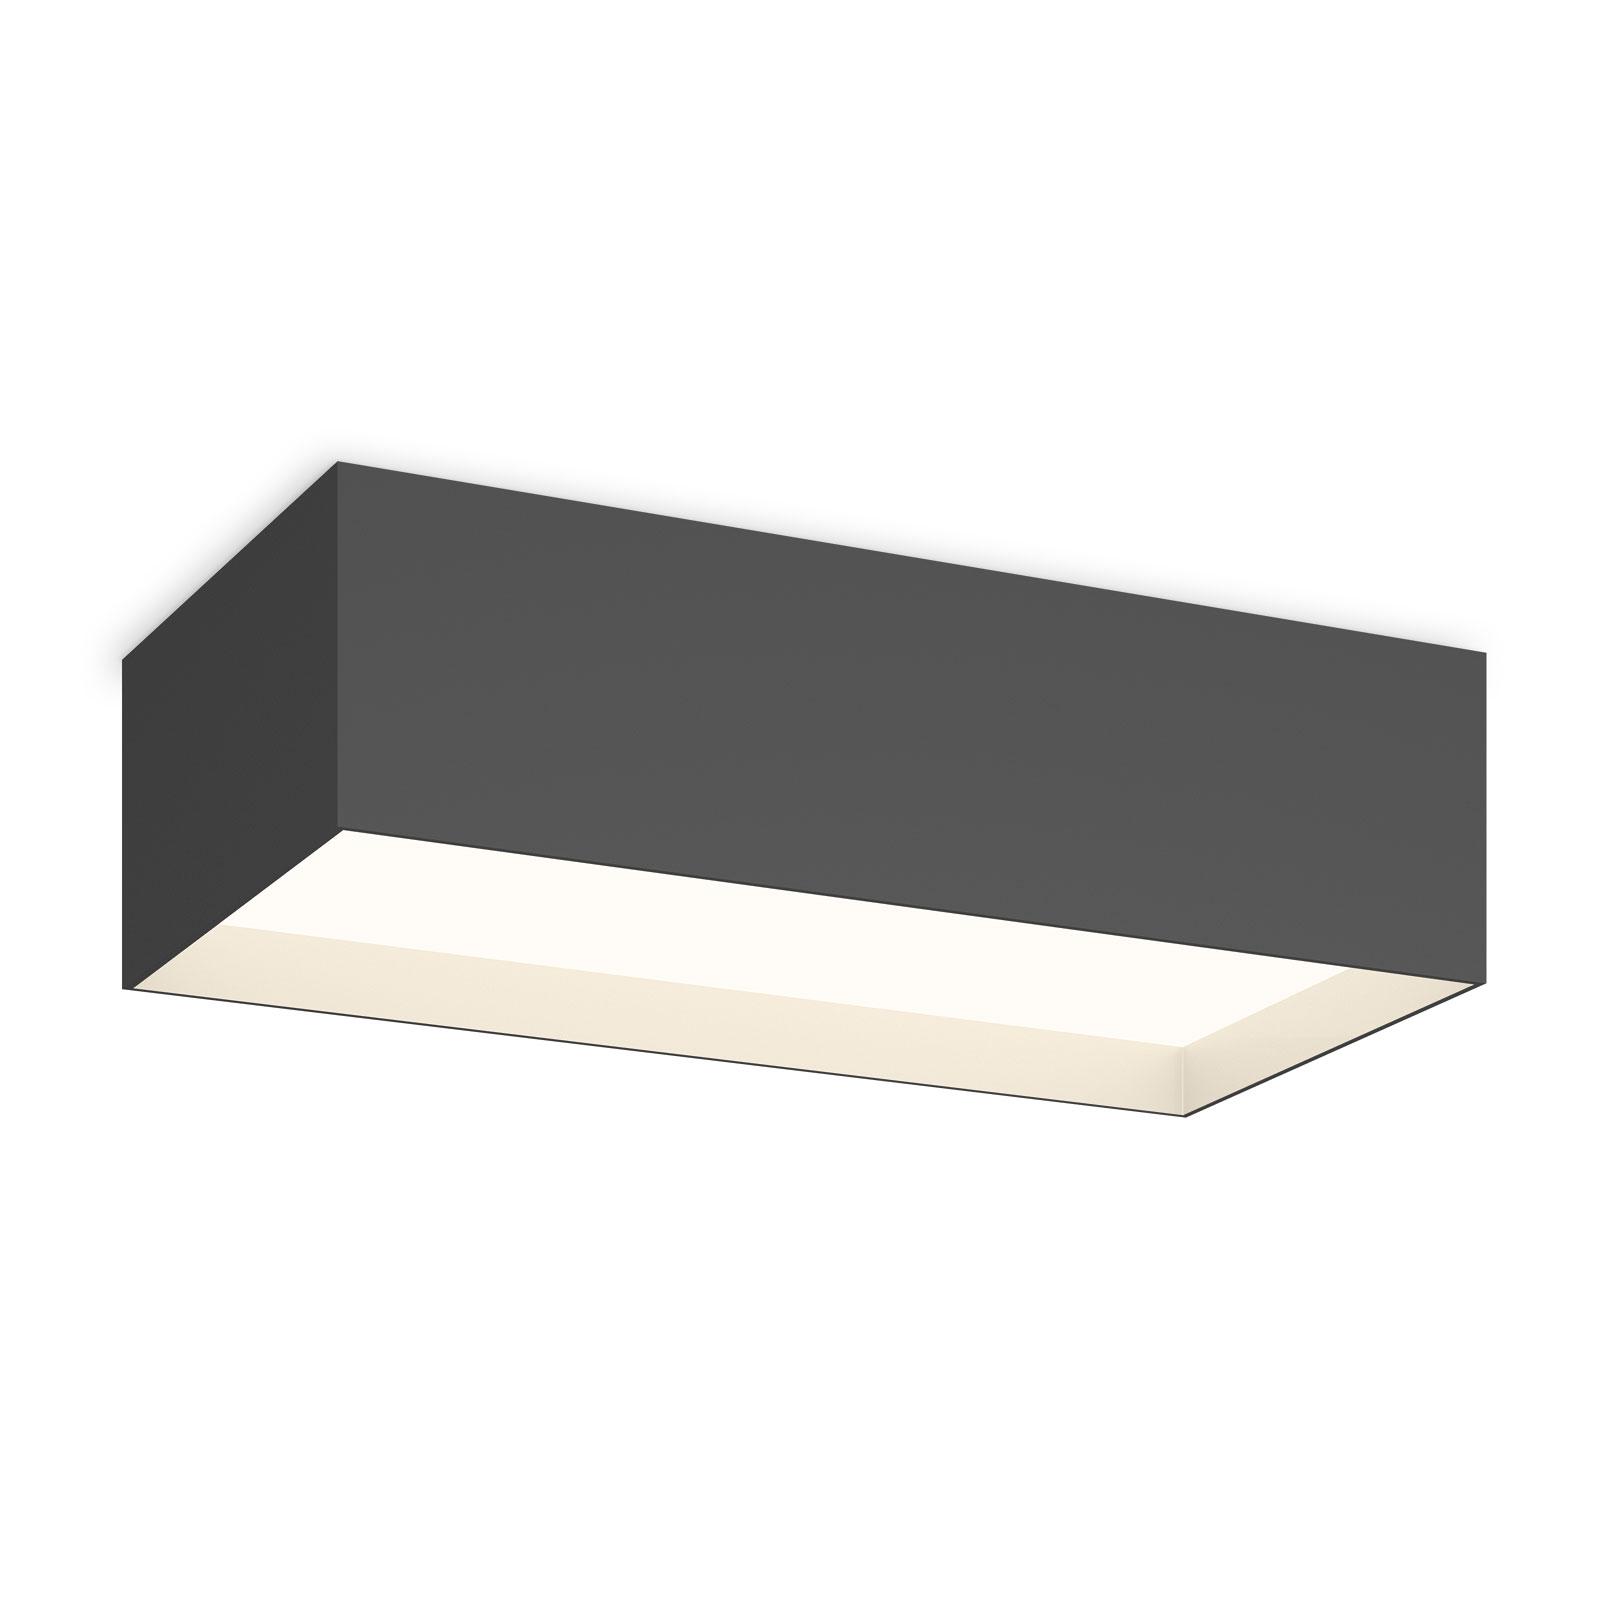 Vibia Structural 2634 plafondlamp 48cm donkergrijs